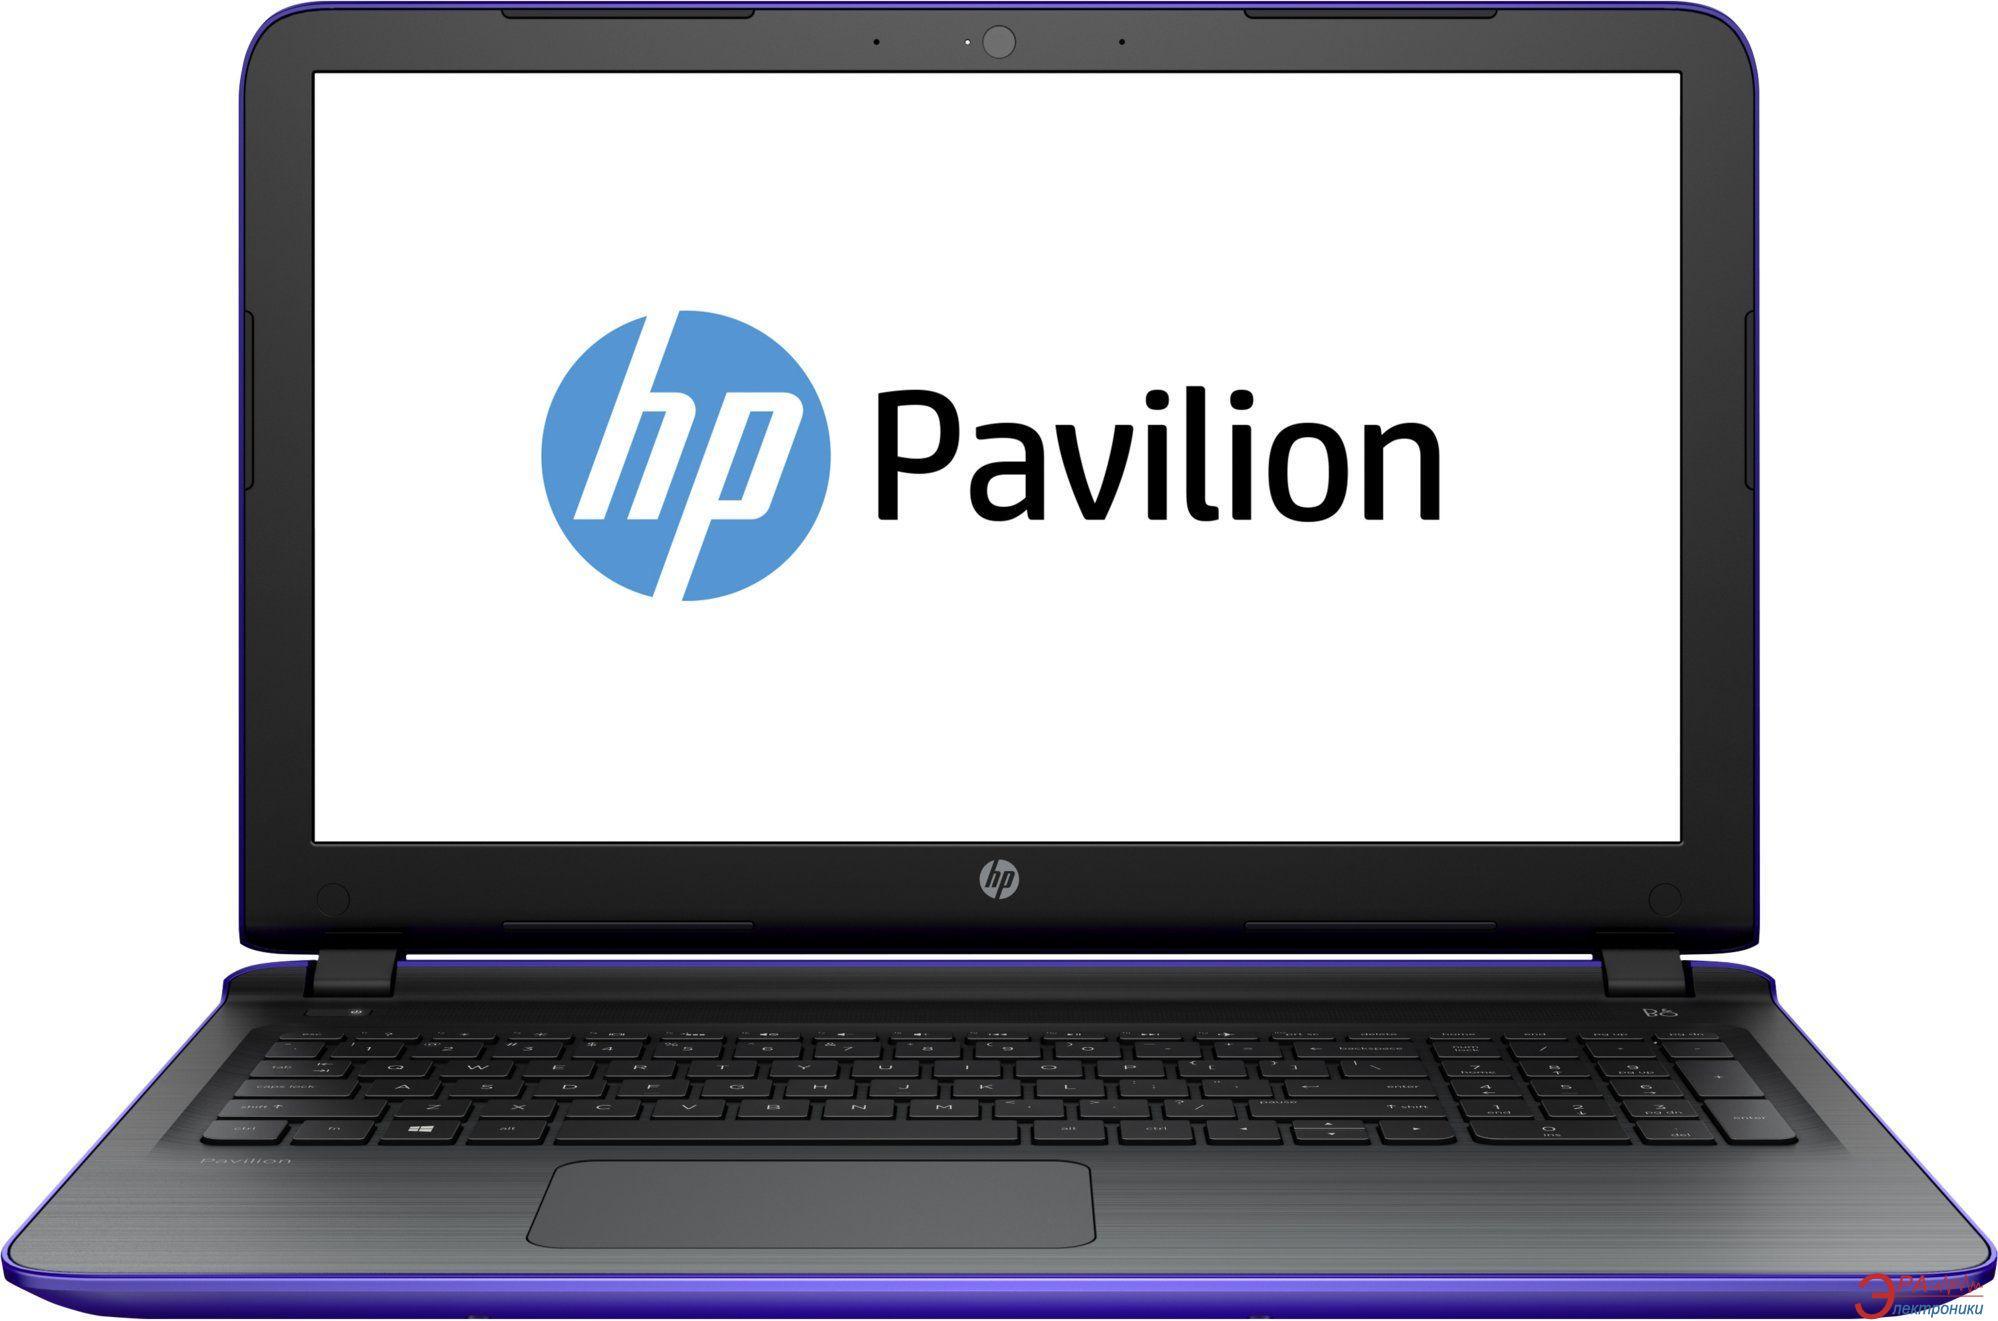 Ноутбук HP Pavilion 15-ab145ur (V4P46EA) Purple 15,6